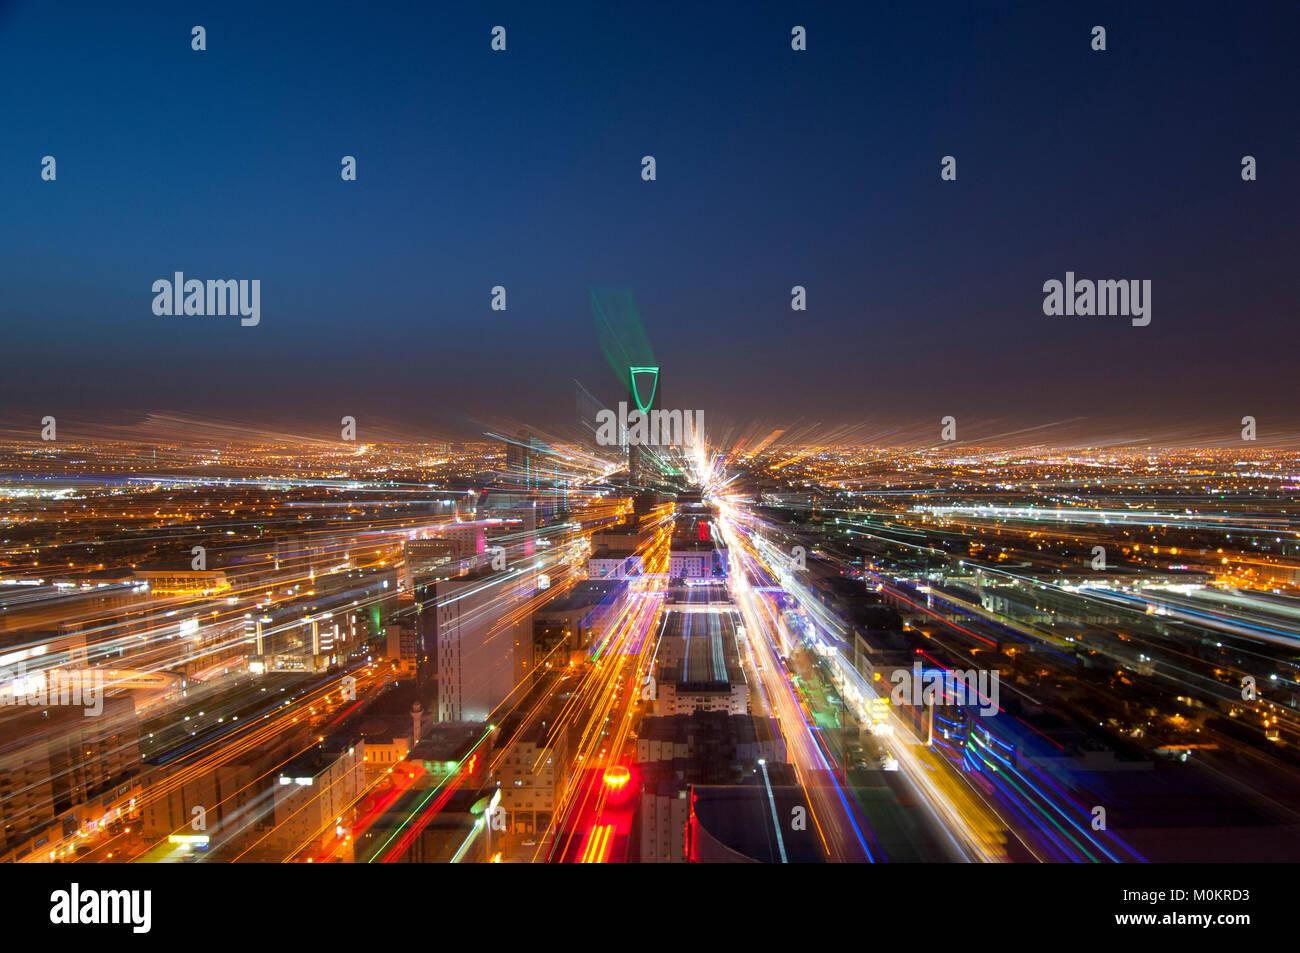 Riyadh skyline at night #4 Photo Stock